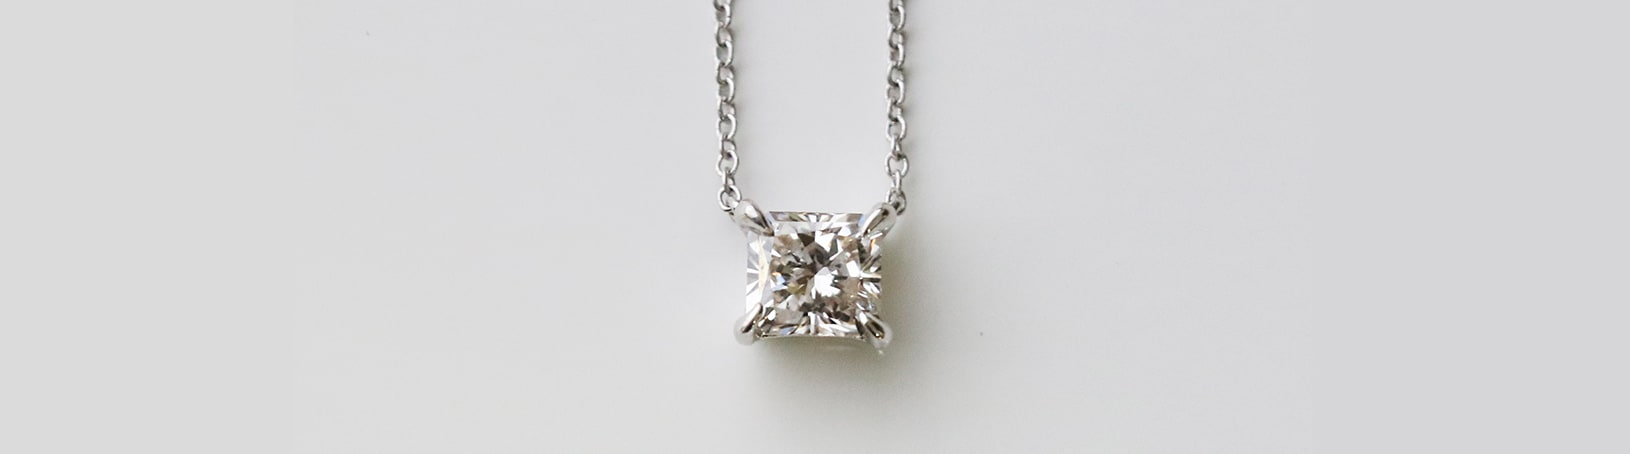 A stylish princess cut necklace